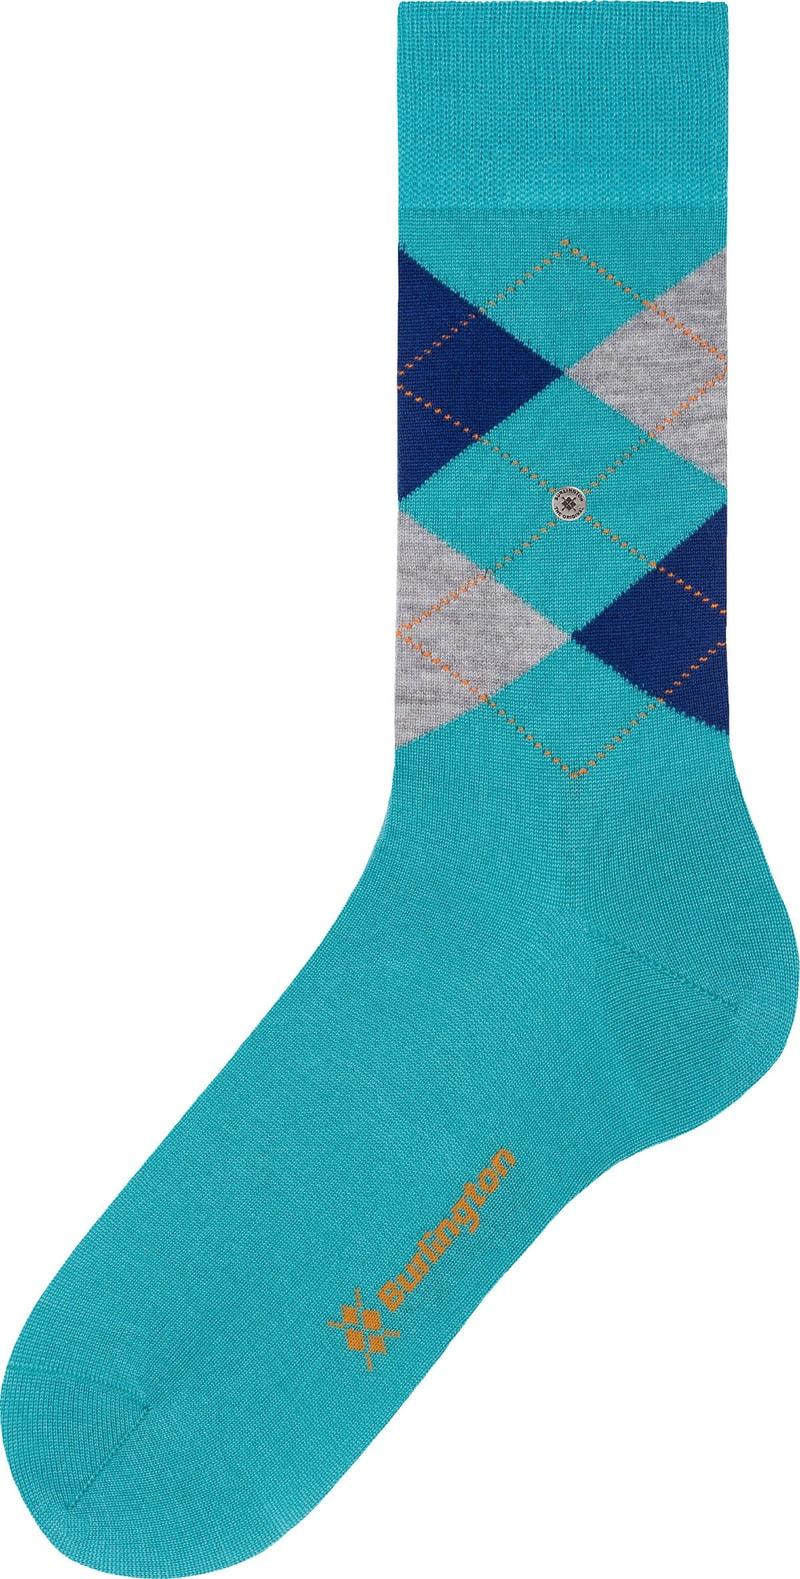 Burlington Socks Edinburgh 7332 photo 2